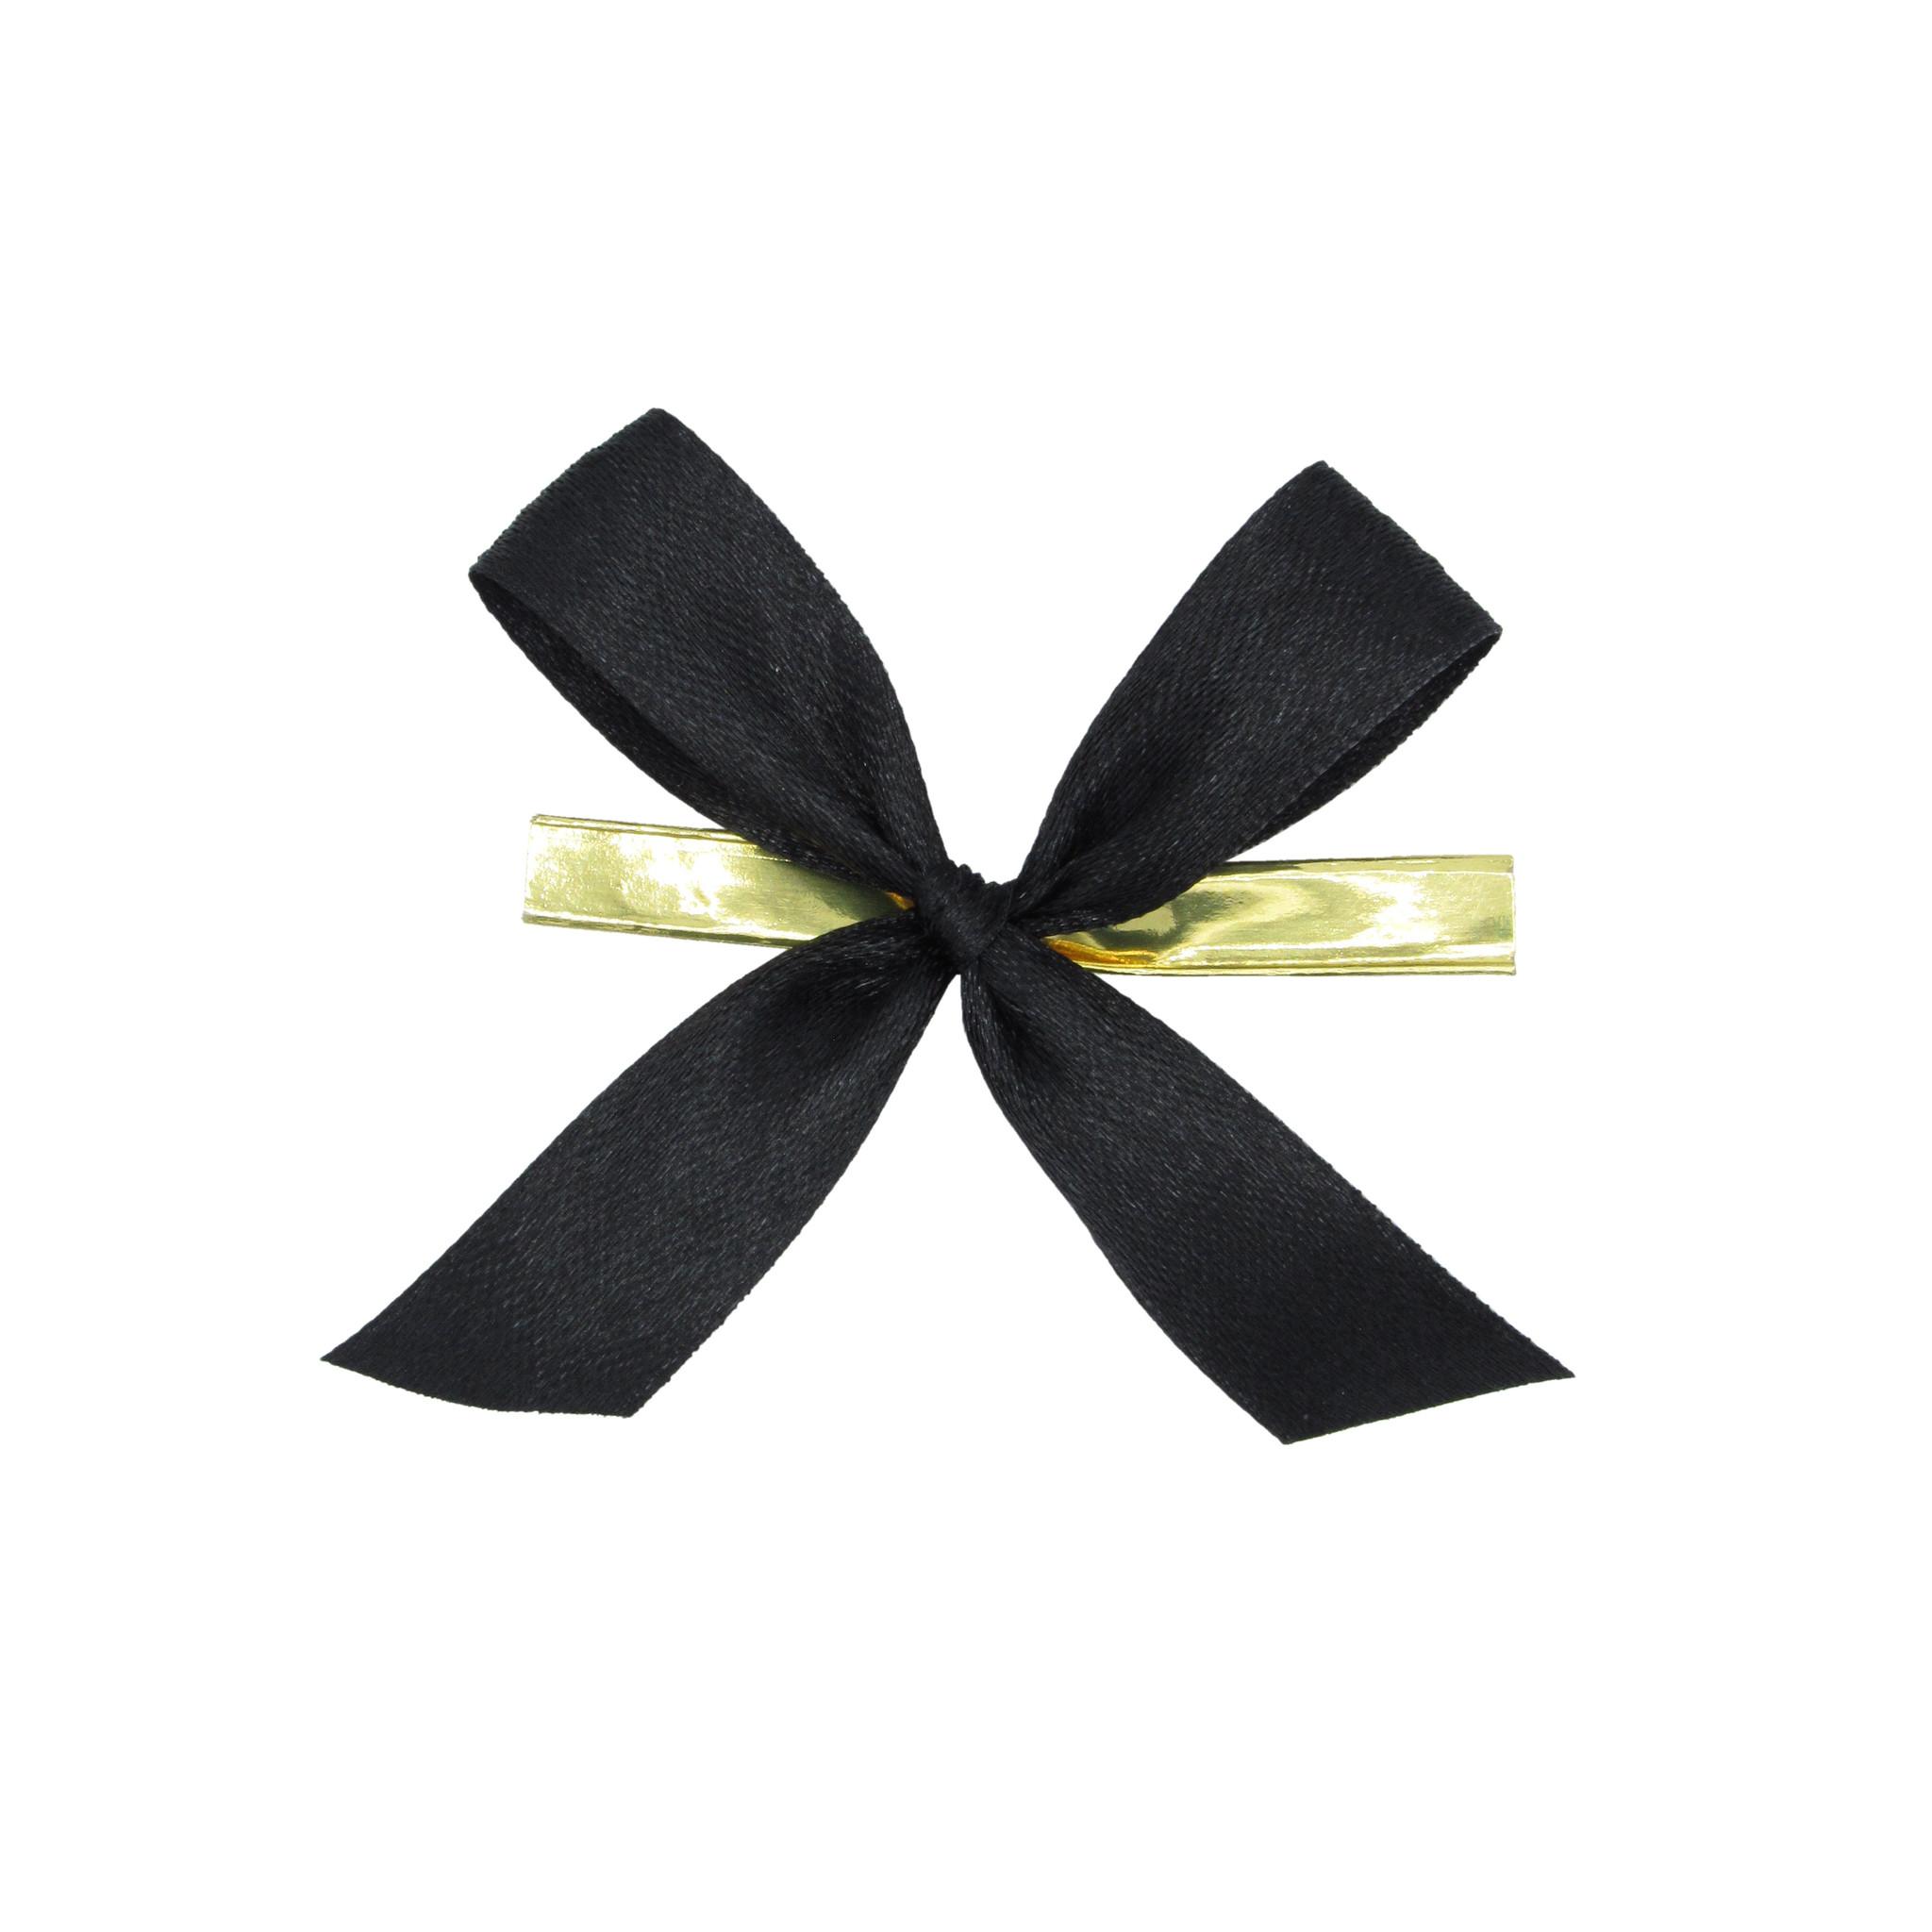 Cinta lazo de raso con clip - negro